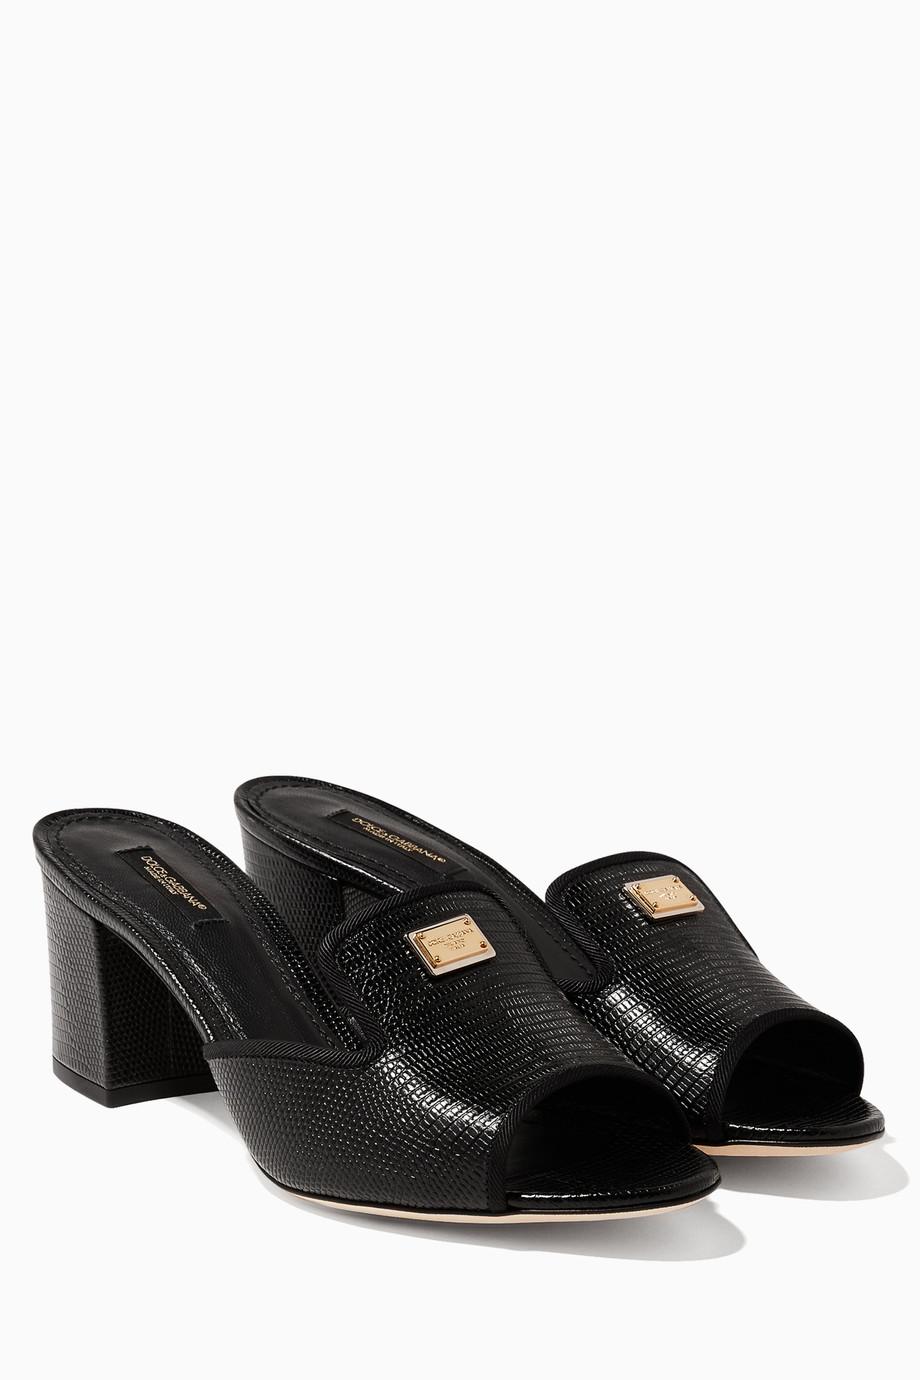 ecd254fe1a9 Shop Dolce   Gabbana Black Black Bianca Iguana Sandals for Women ...